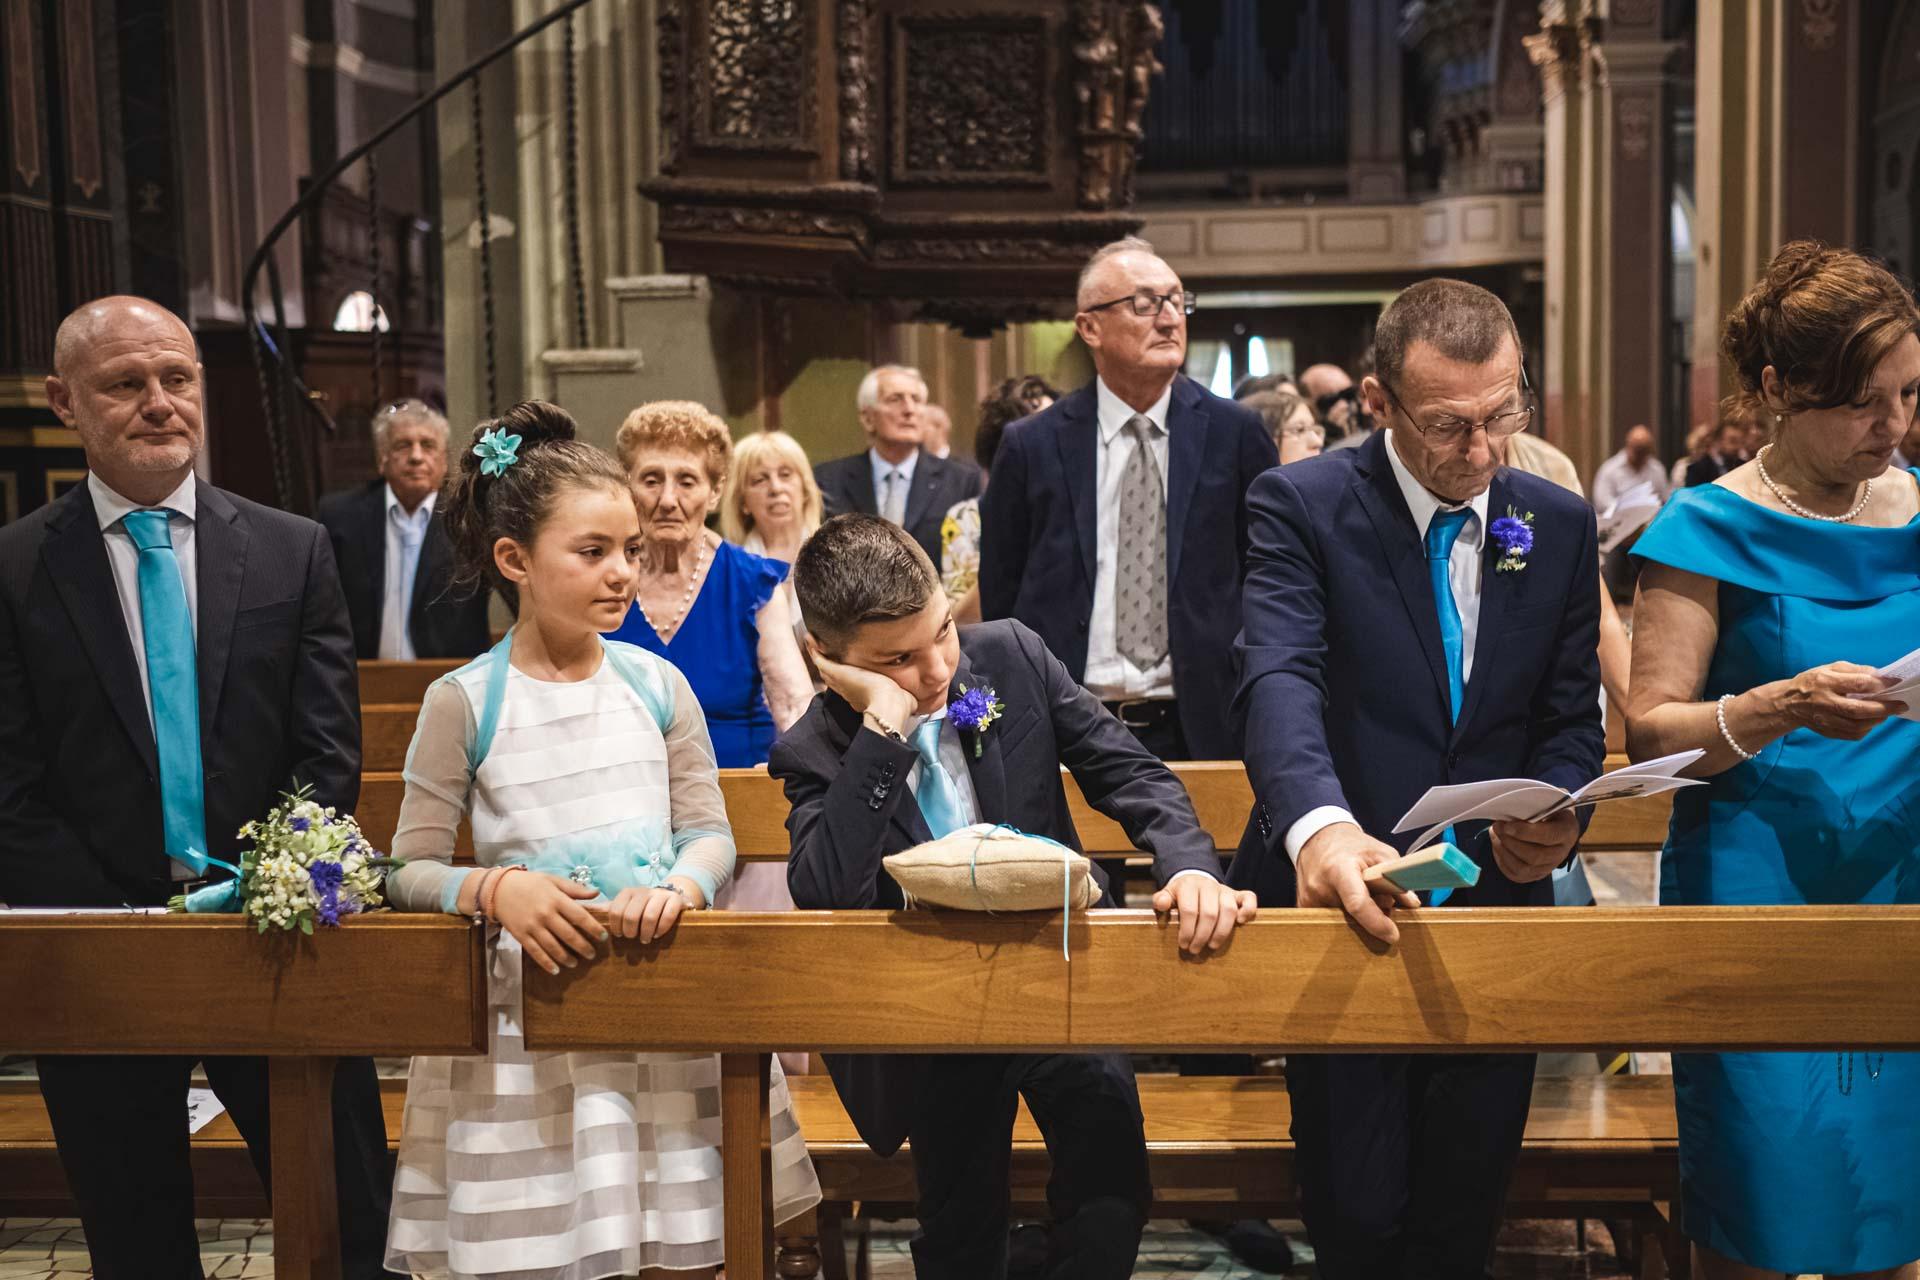 chiesa interno matrimonio invitati